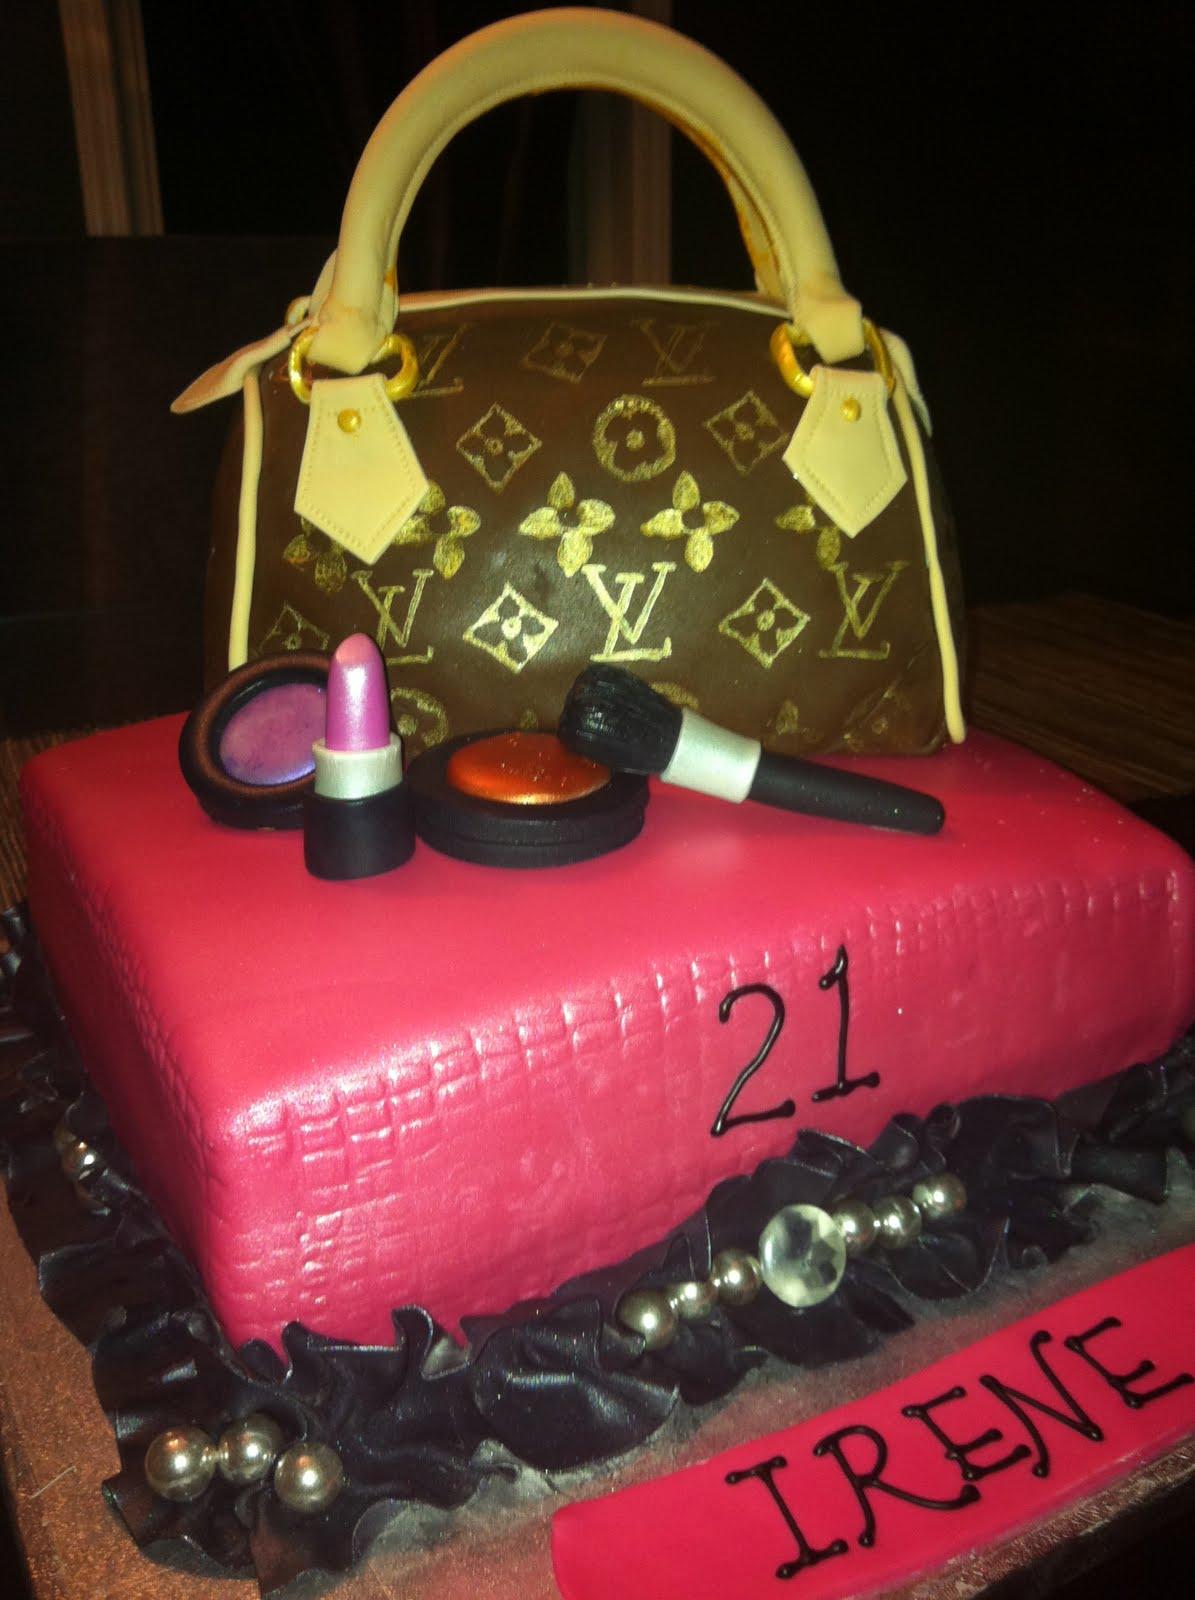 Jocelyns Wedding Cakes And More Louis Vuitton Purse Cake Edible 21st Birthday